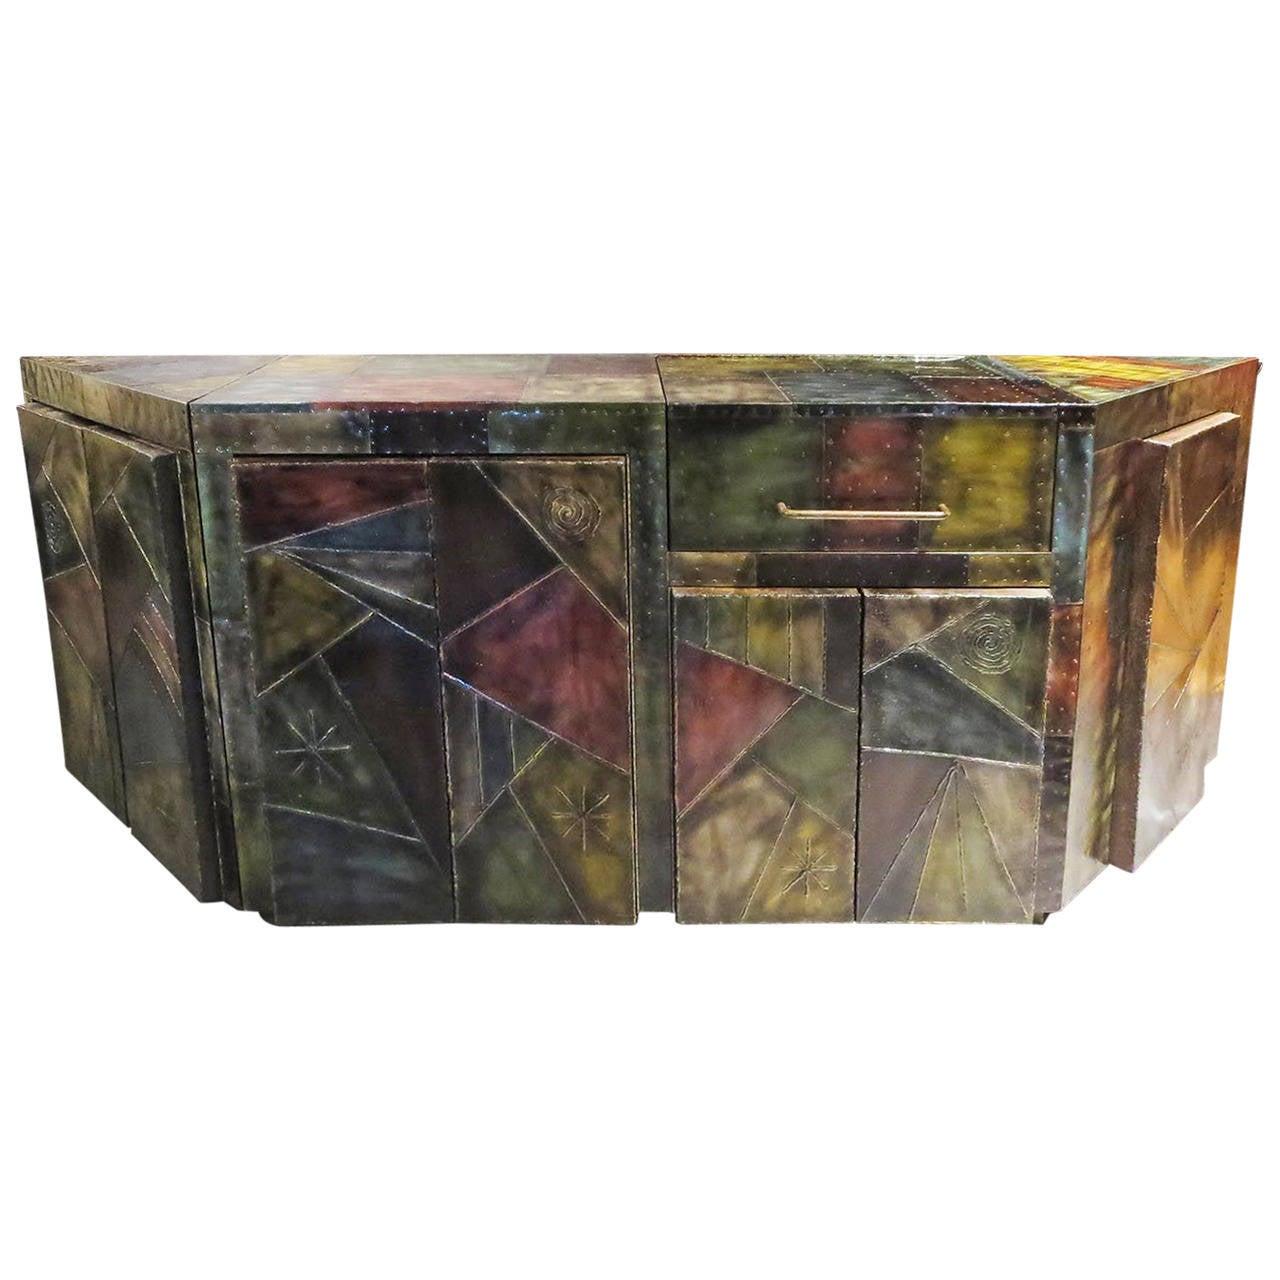 Paul Evans Custom Cabinet with Built in Bar Sink